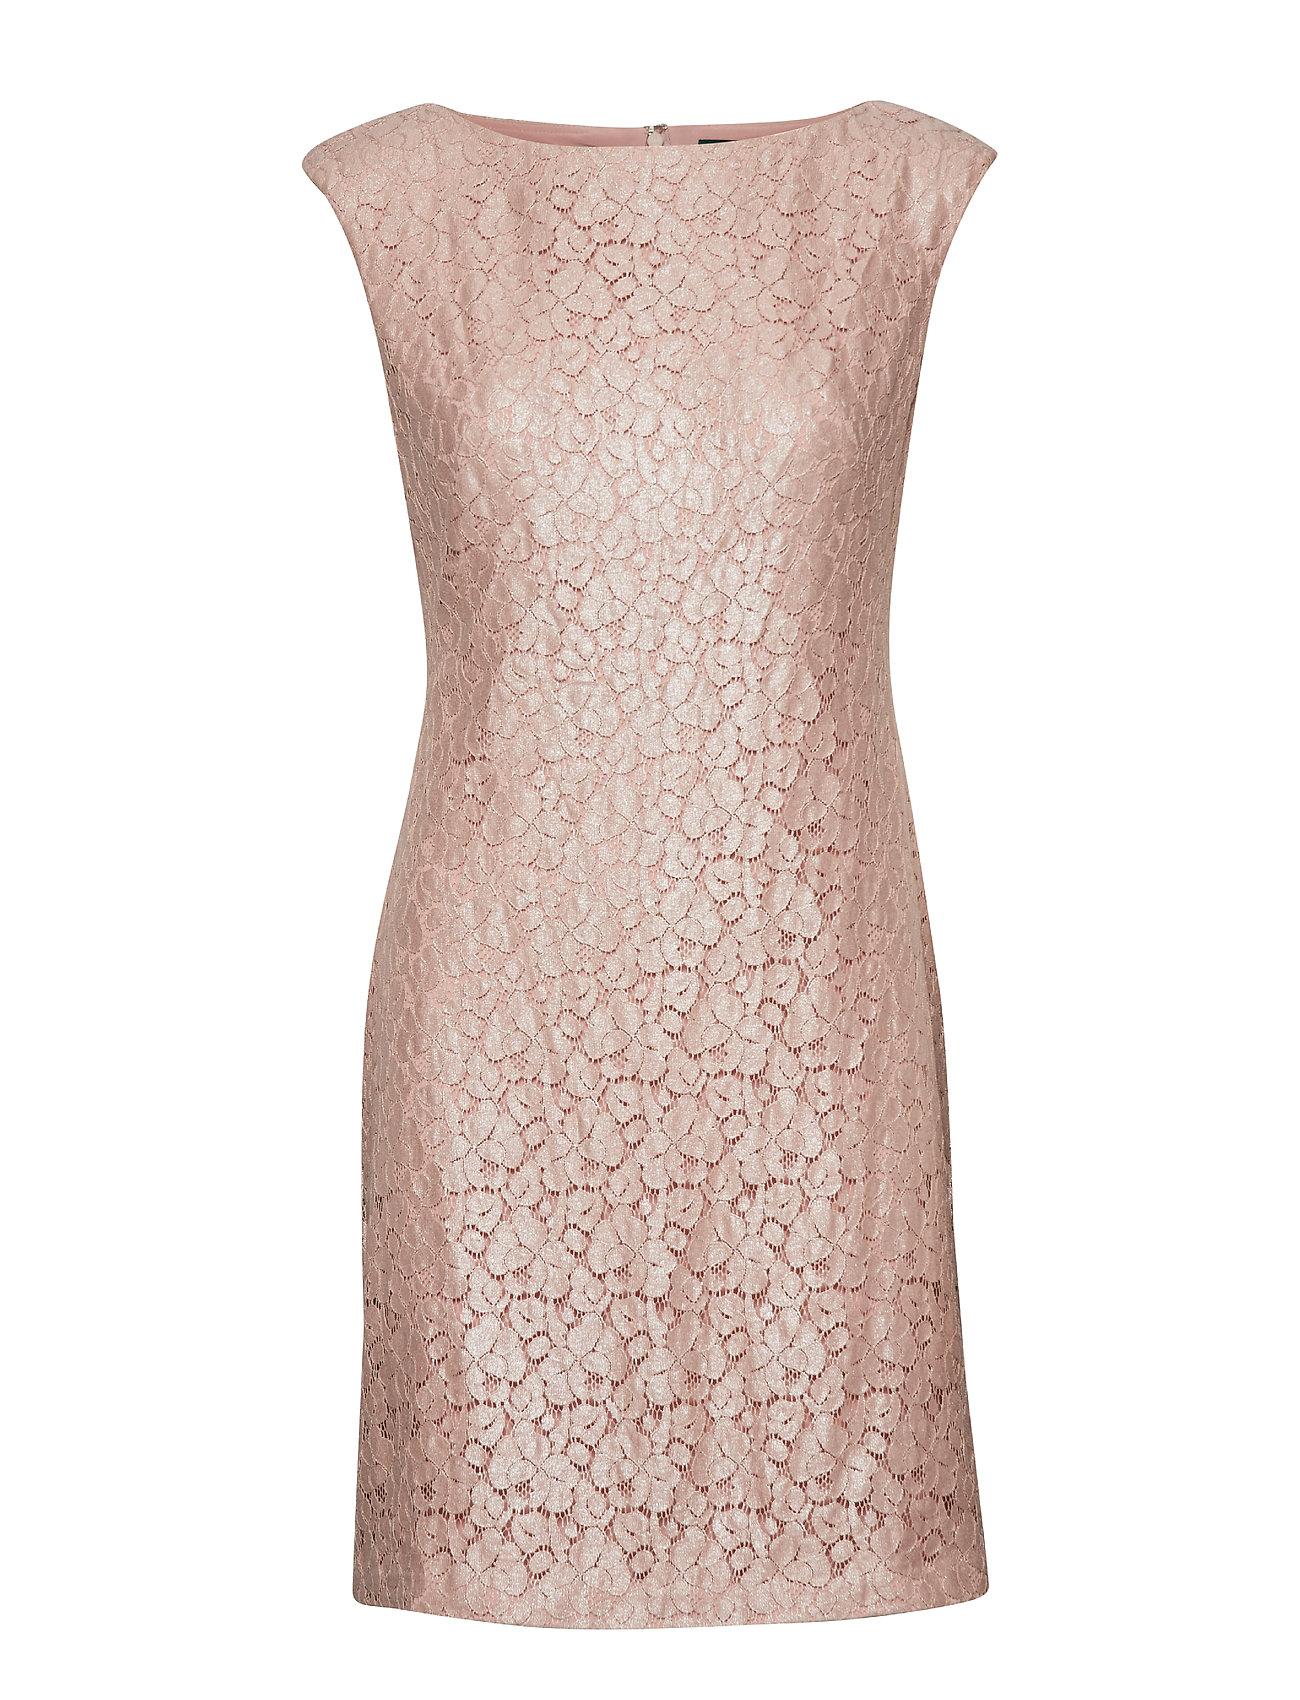 Lauren Ralph Lauren Lace Cap-Sleeve Dress - ROSE